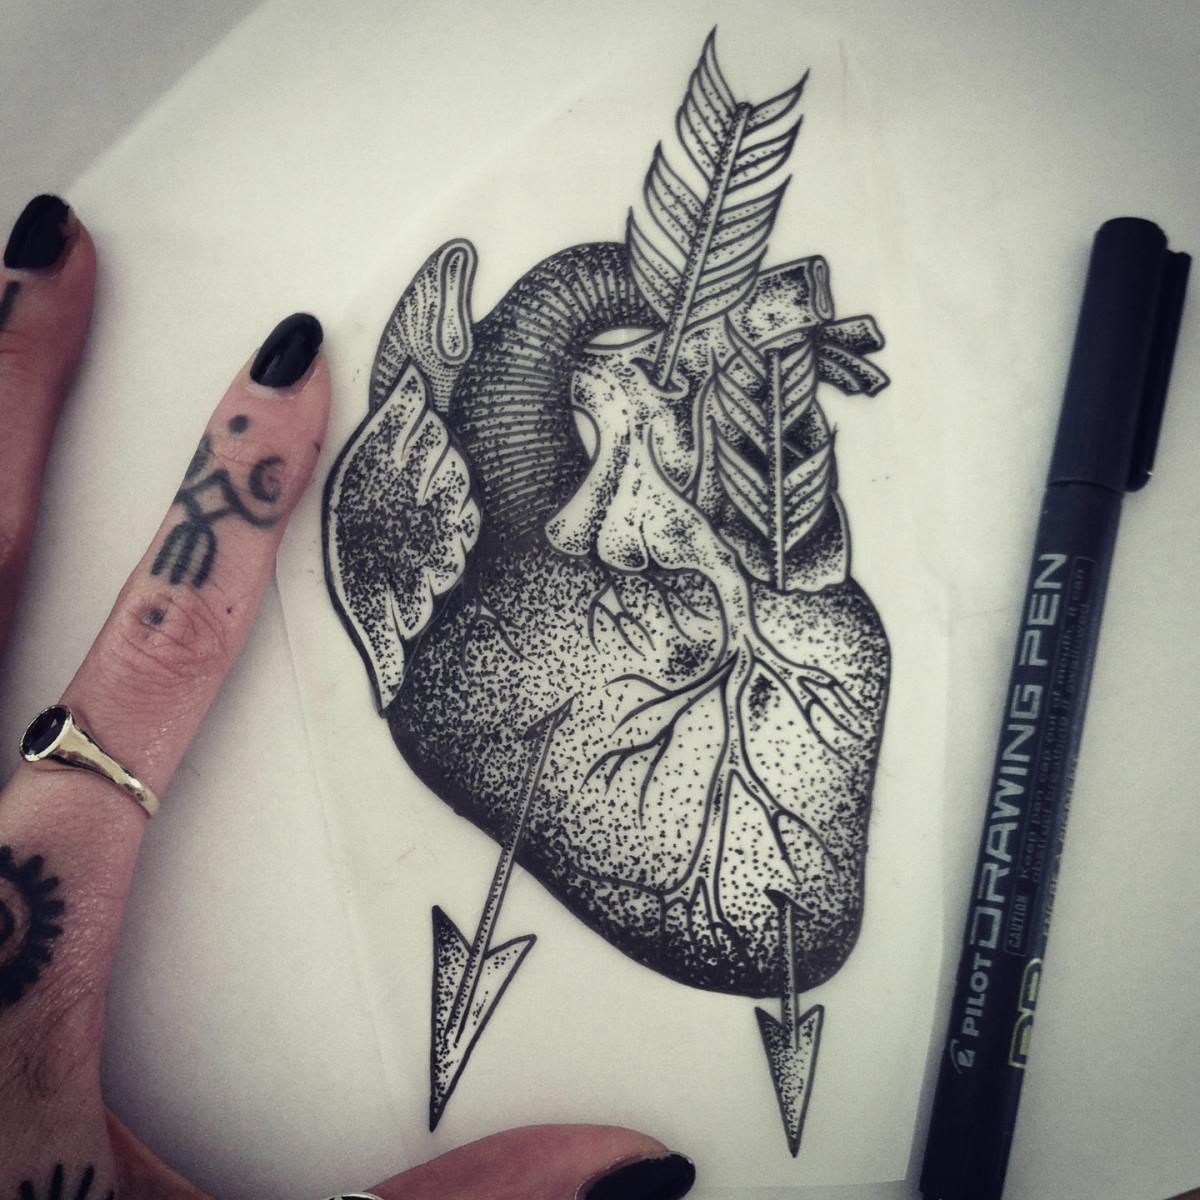 By Hannah Pixie Snowdon